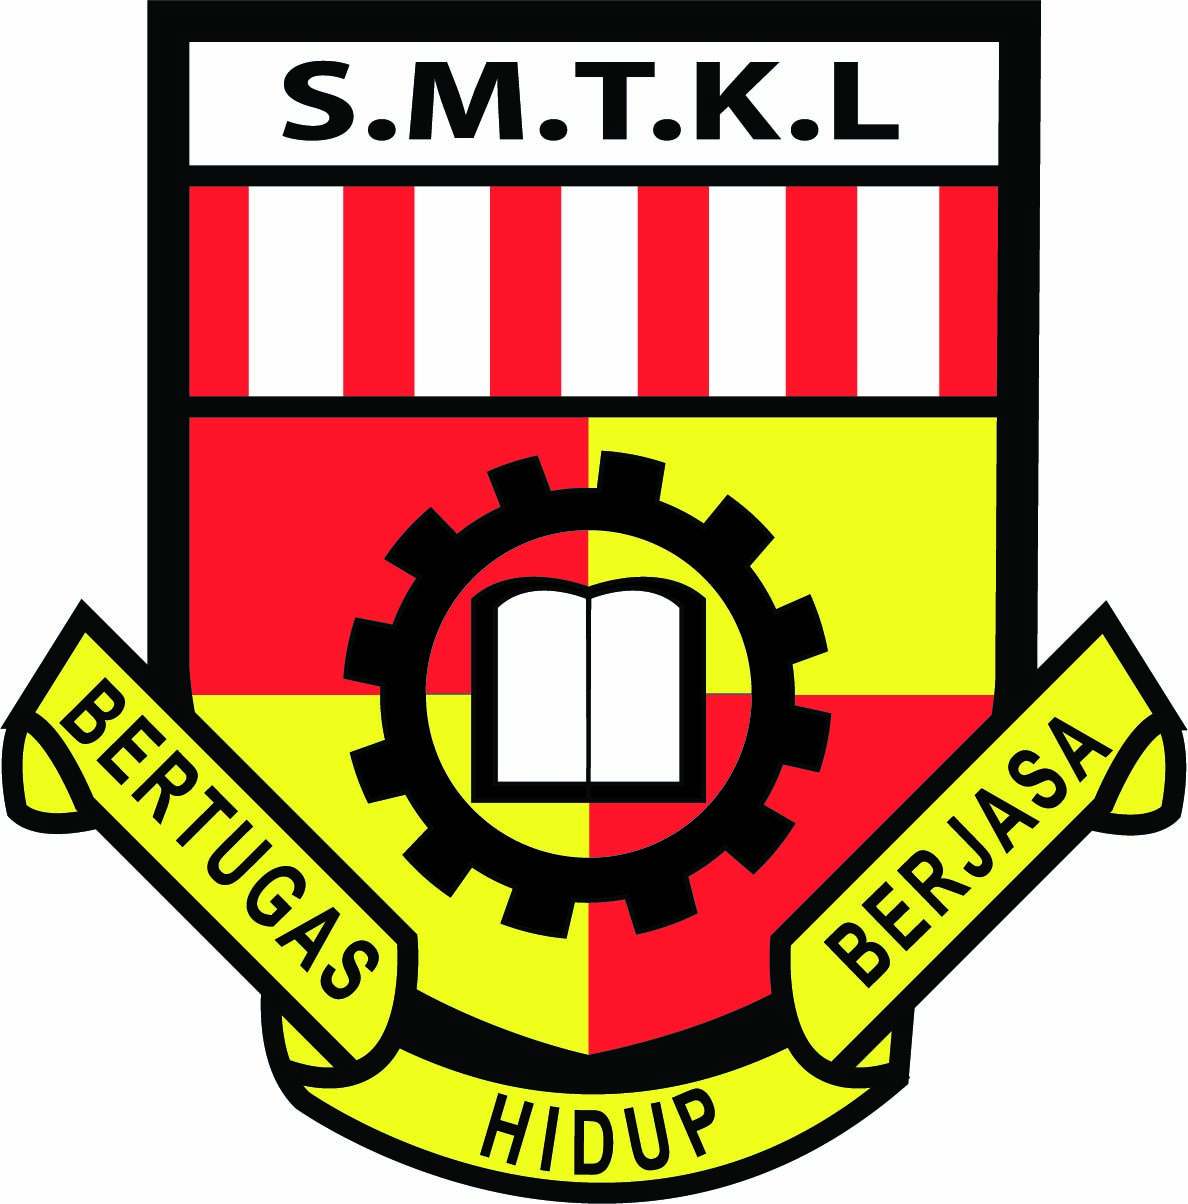 Sekolah Menengah Teknik Kuala Lumpur Wikipedia Bahasa Melayu Ensiklopedia Bebas